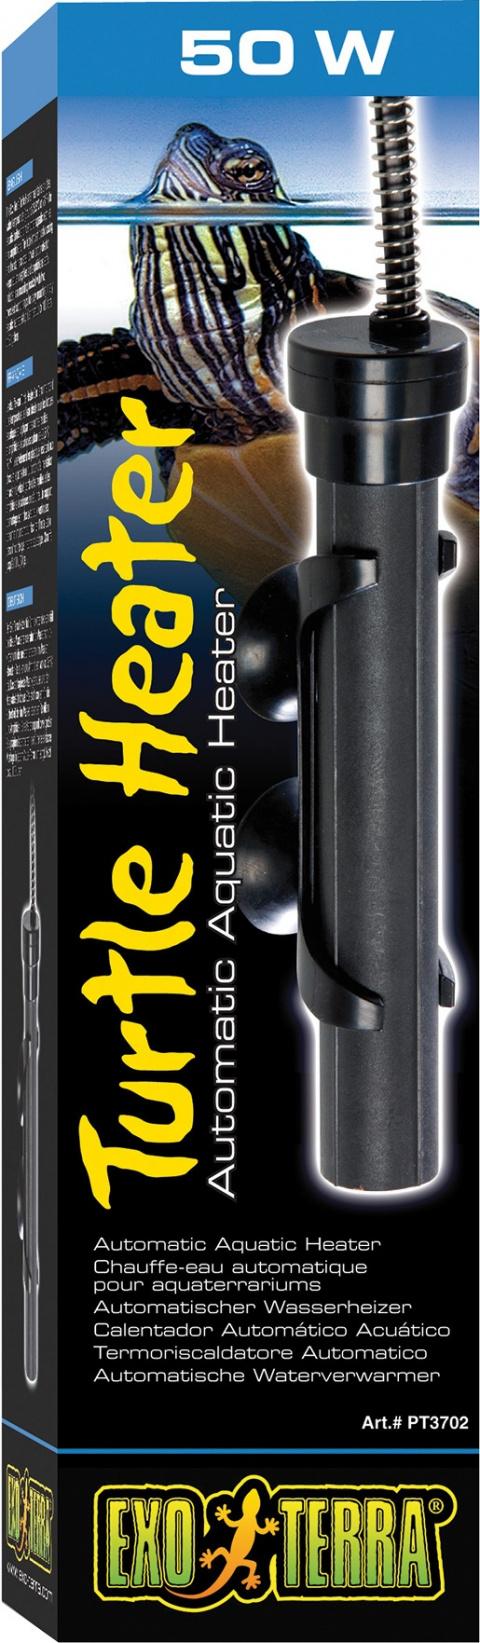 Aksesuari terarijem - ExoTerra Turtle Heater 50W